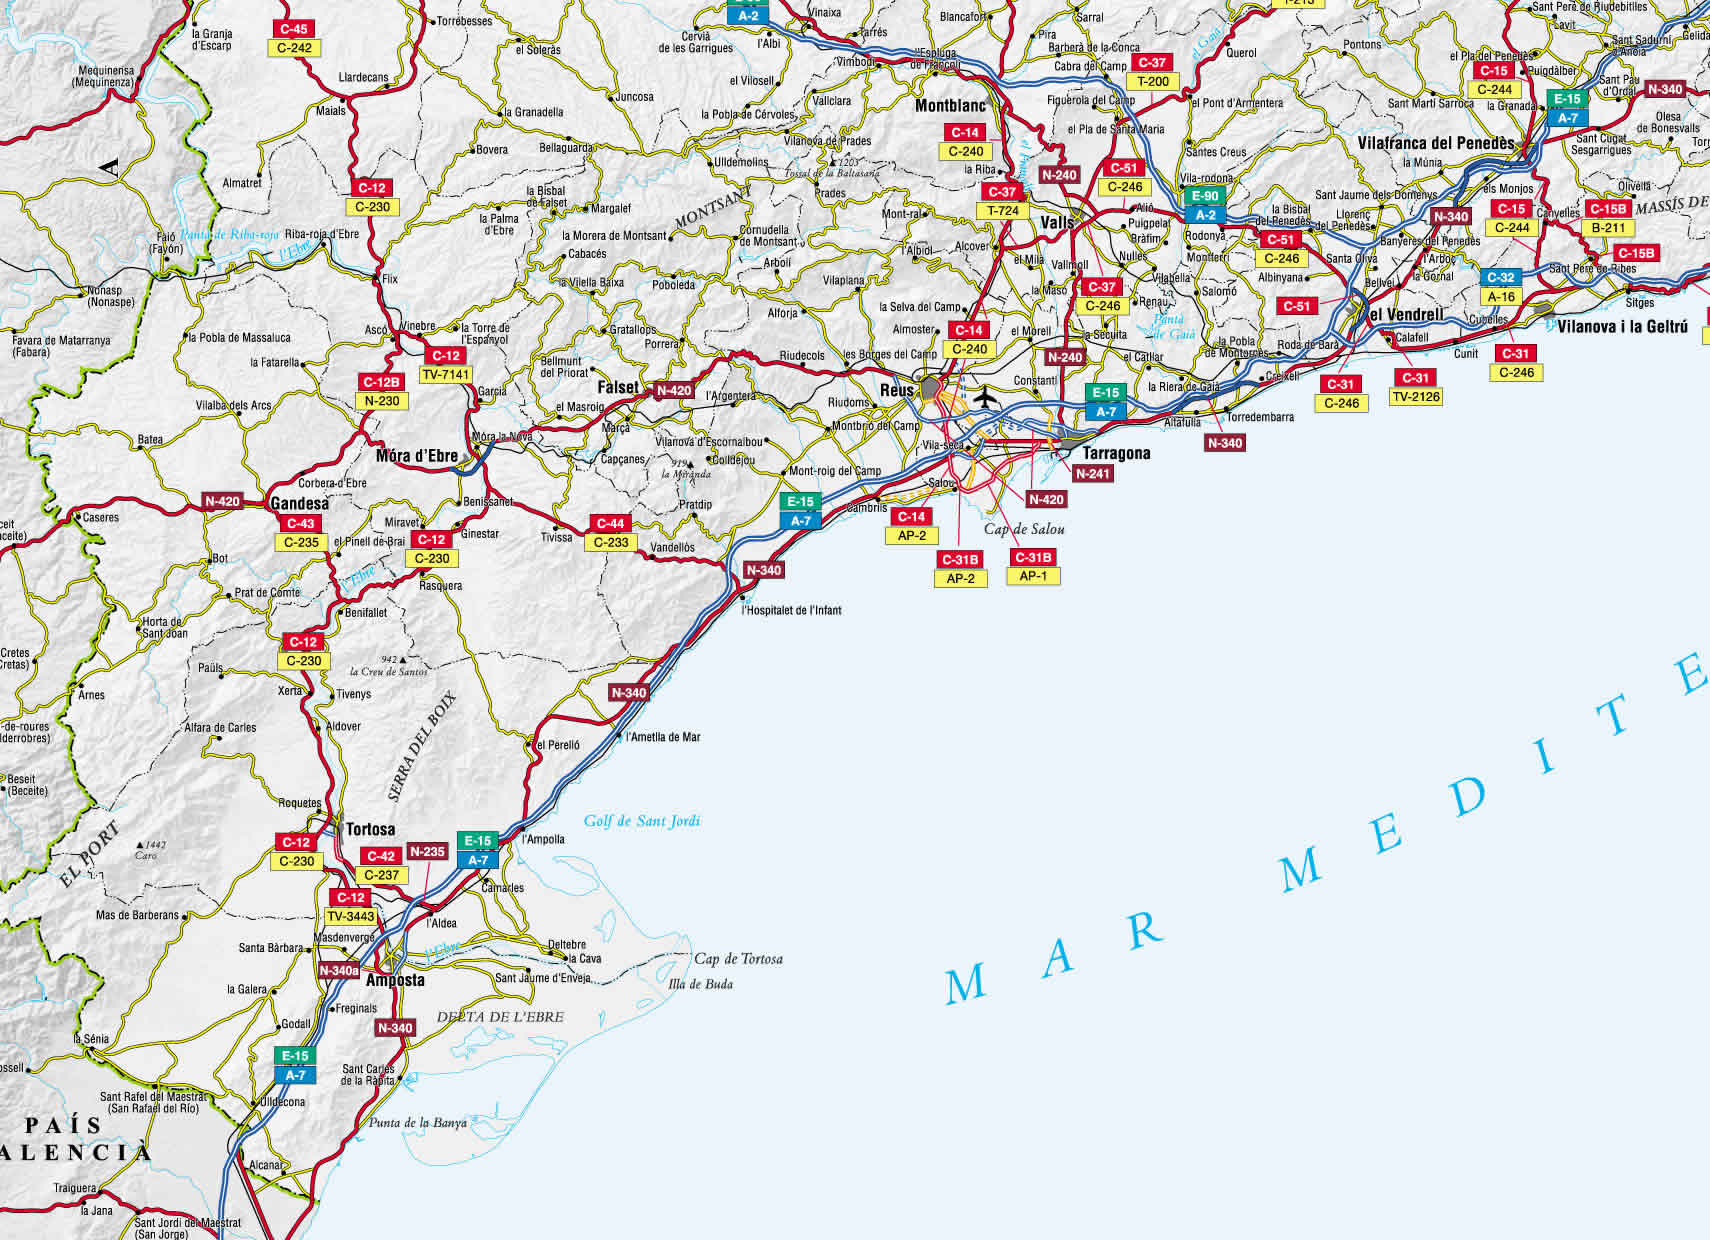 Mapa de carreteras de la Provincia de Tarragona